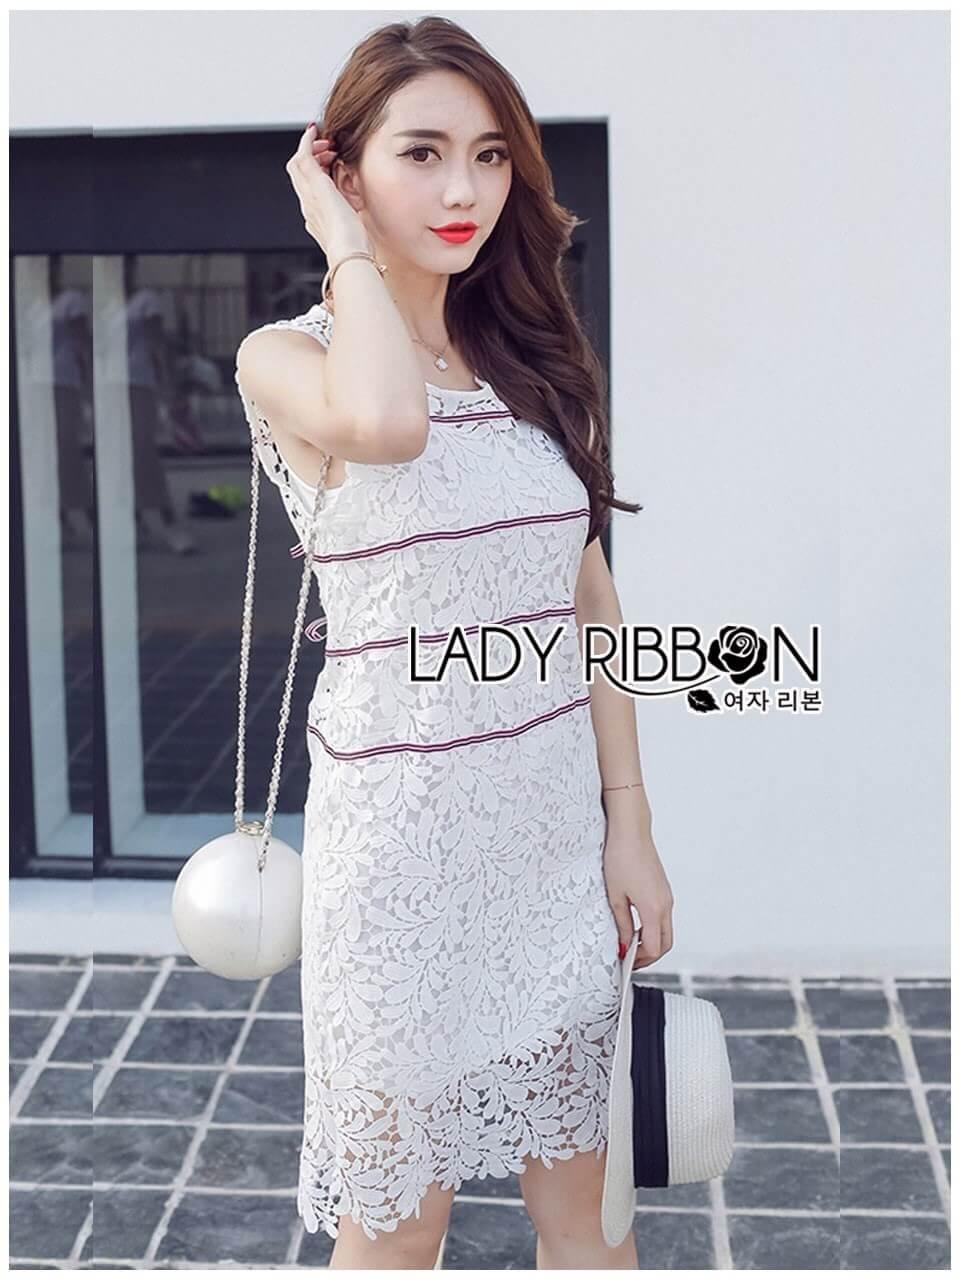 &#x1F380 Lady Ribbon's Made &#x1F380 Lady Kate Sporty Sweet White Lace Dress